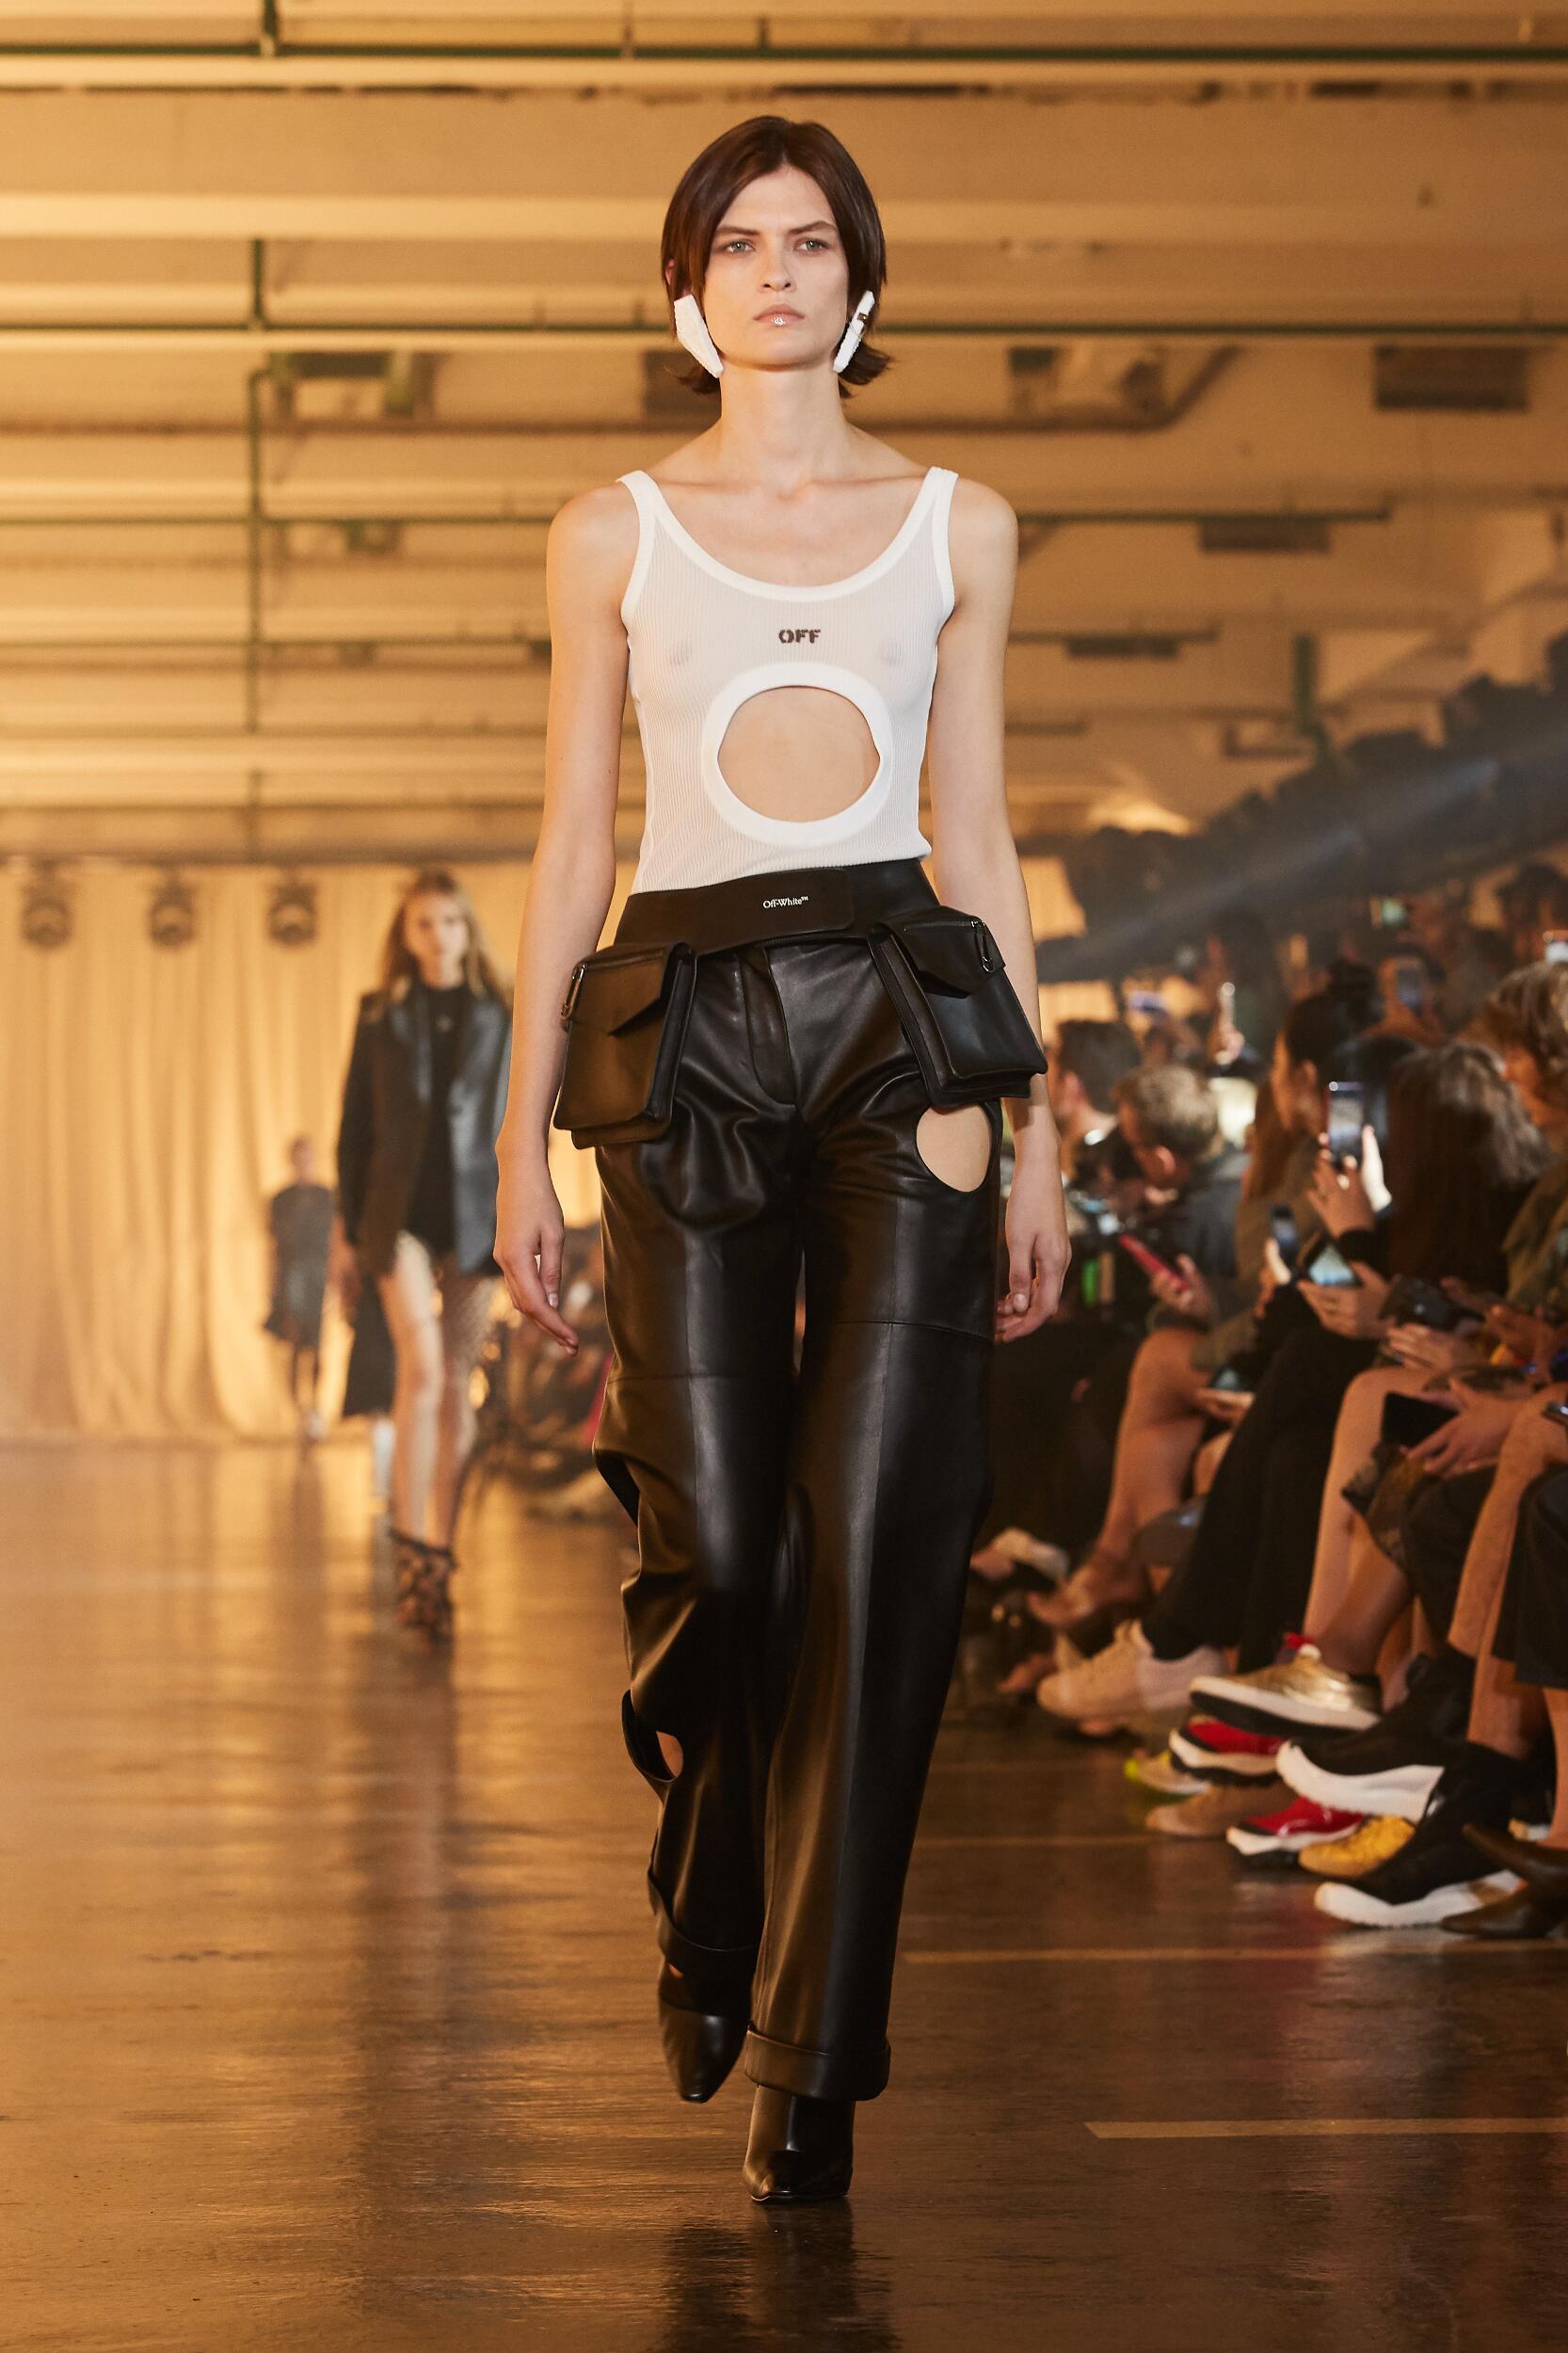 Runway Off White c/o Virgil Abloh Spring Summer 2020 Women's Collection Paris Fashion Week